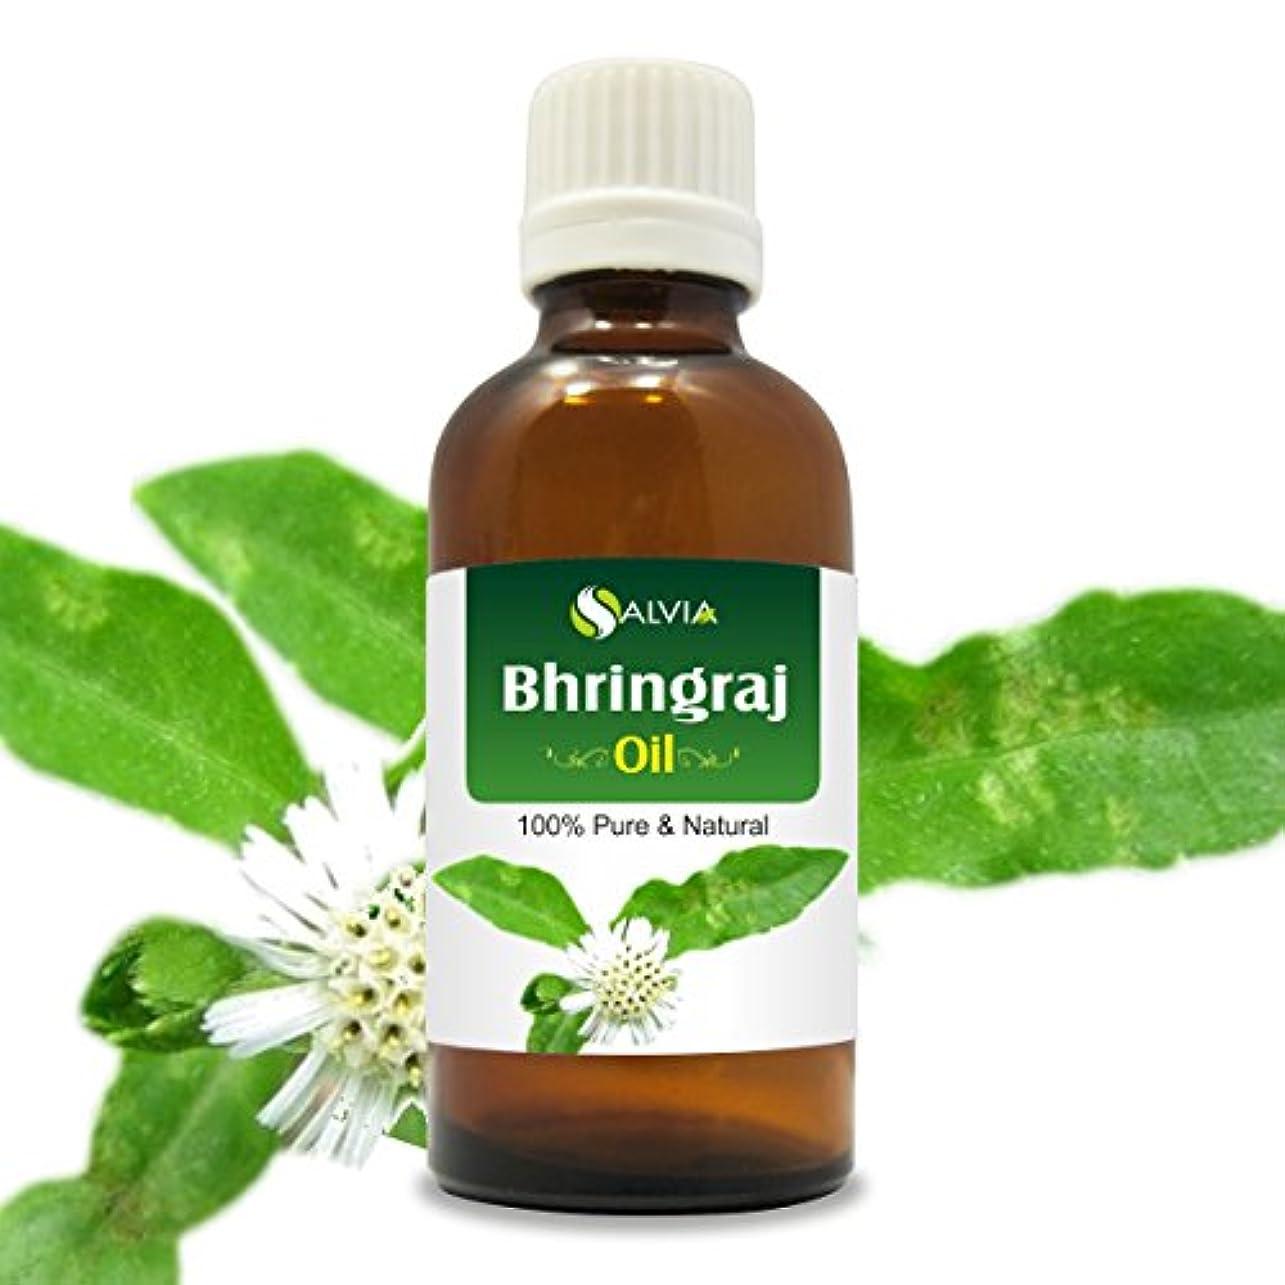 高度健康的火曜日BHRINGRAJ OIL 100% NATURAL PURE UNDILUTED UNCUT OIL 100ML